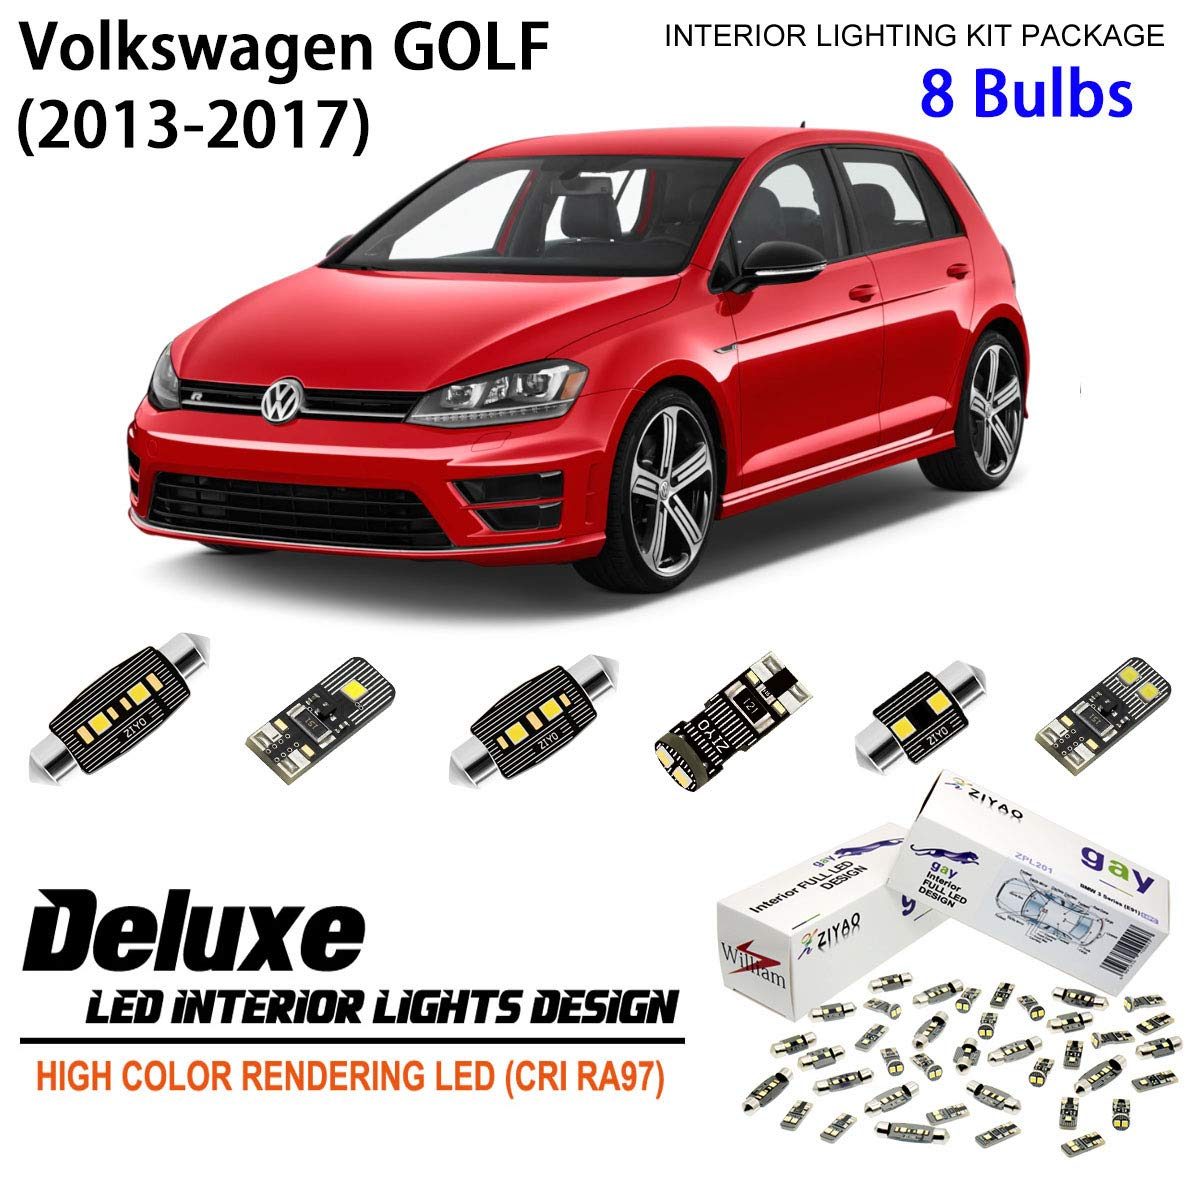 ZIYO ZPL9110- (8 Bulbs) Deluxe LED Interior Light Kit 6000K Xenon White Dome Light Bulbs Replacement Upgrade for 2013-2017 (MK7) Volkswagen Golf/GTI